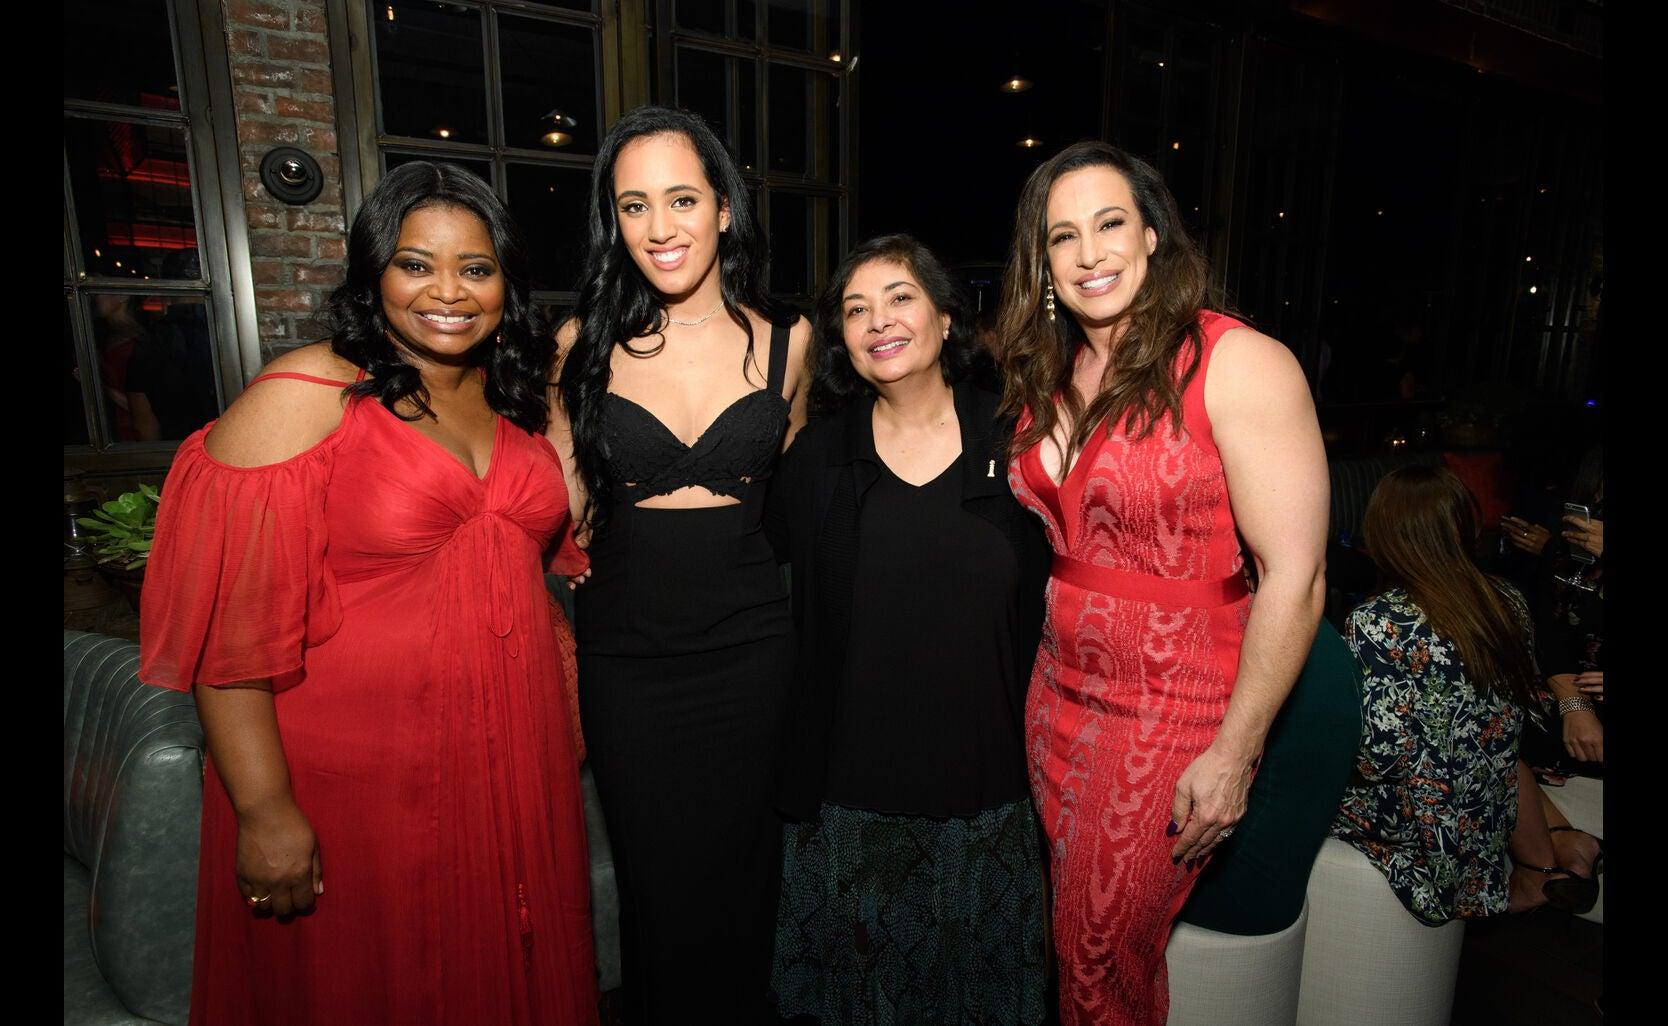 Octavia Spencer, Golden Globe Ambassador Simone Garcia Johnson, HFOA president Meher Tatan and Dany Garcia, Simone's mother, at the Ambassador 2018 event